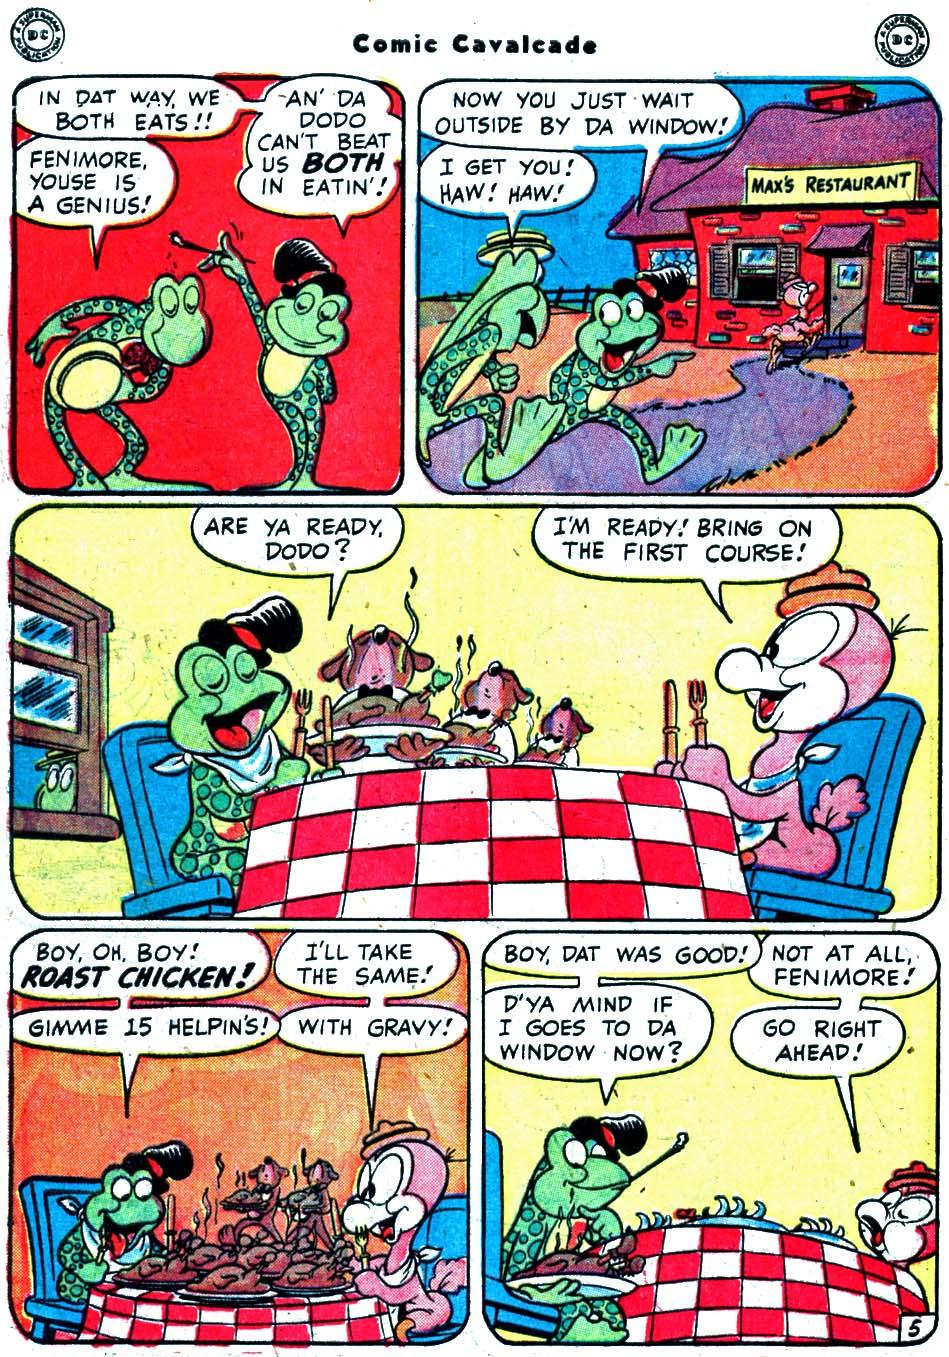 Comic Cavalcade issue 32 - Page 70